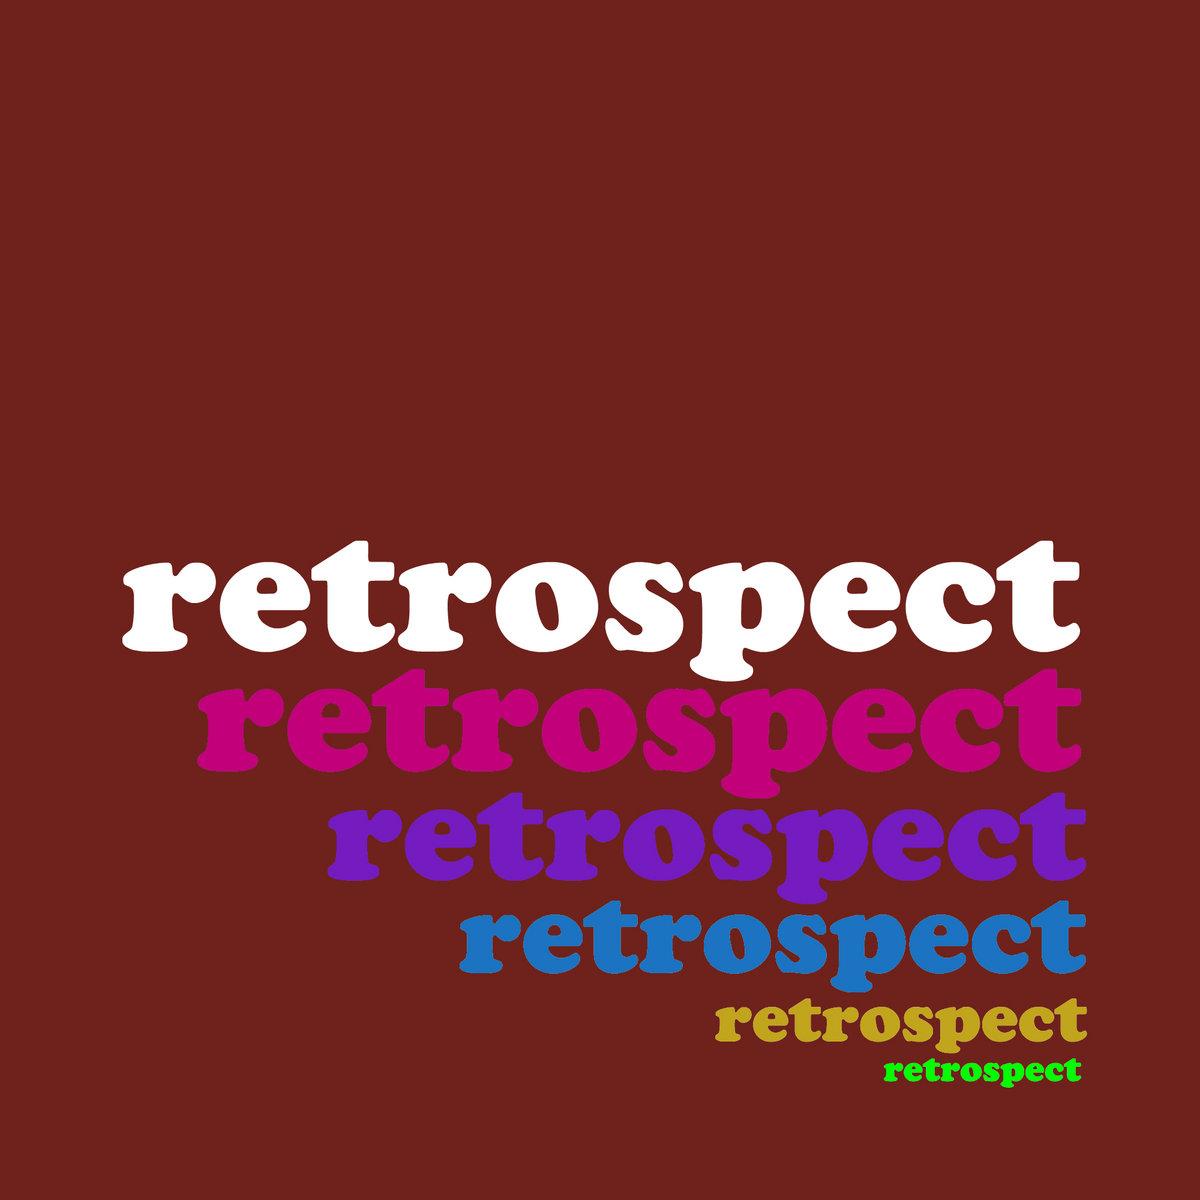 retrispect